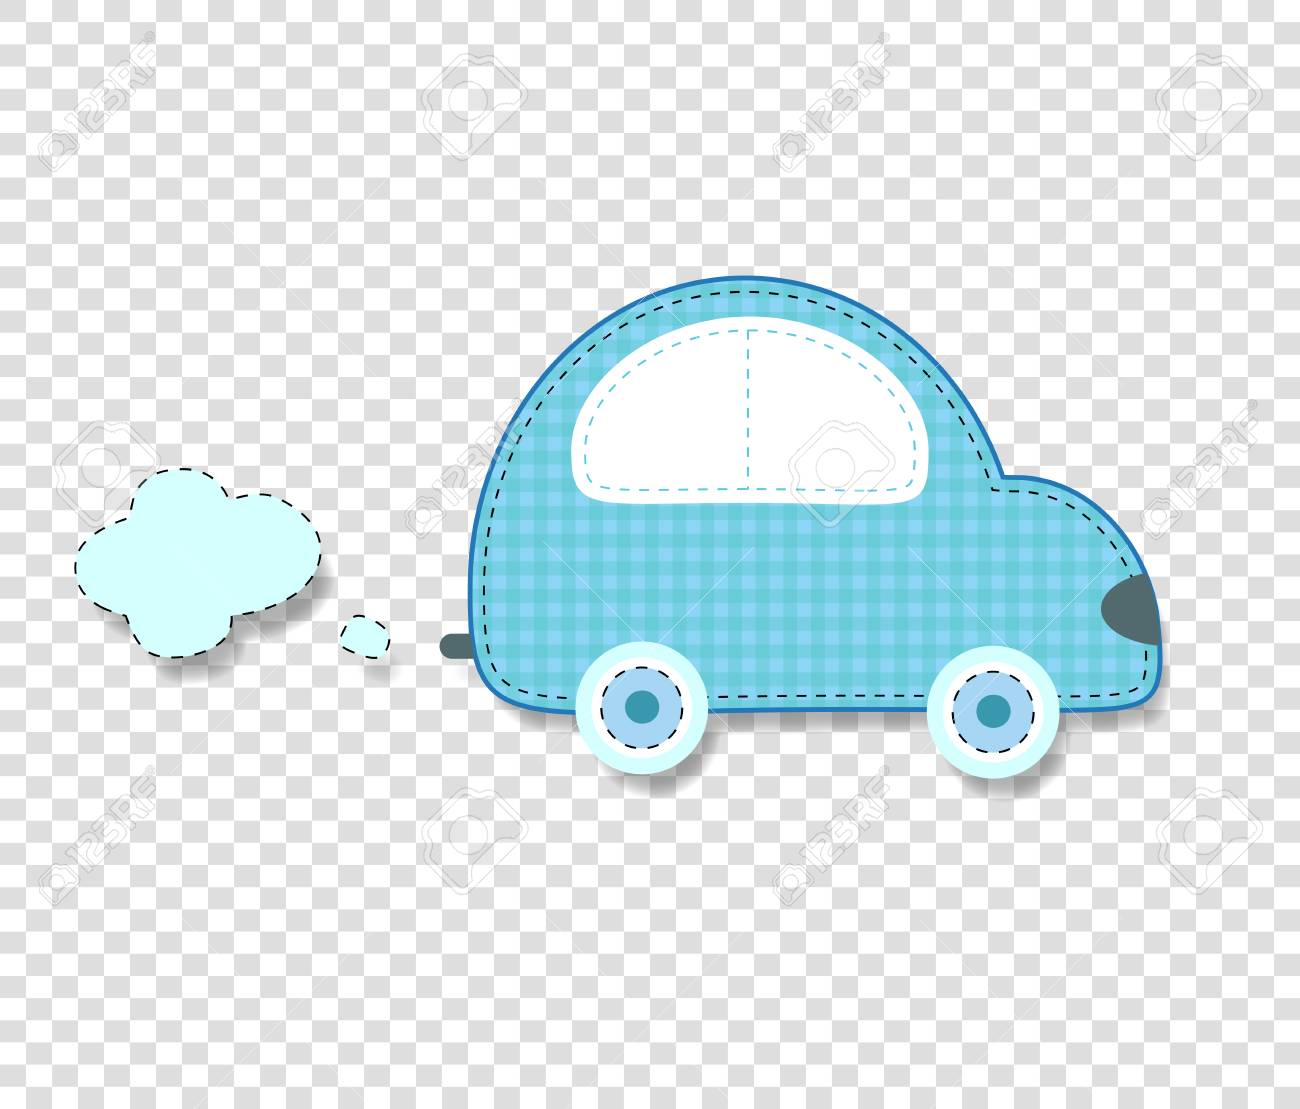 Cute Baby Boy Vector Clip Art Element For Scrapbook Or Baby Shower